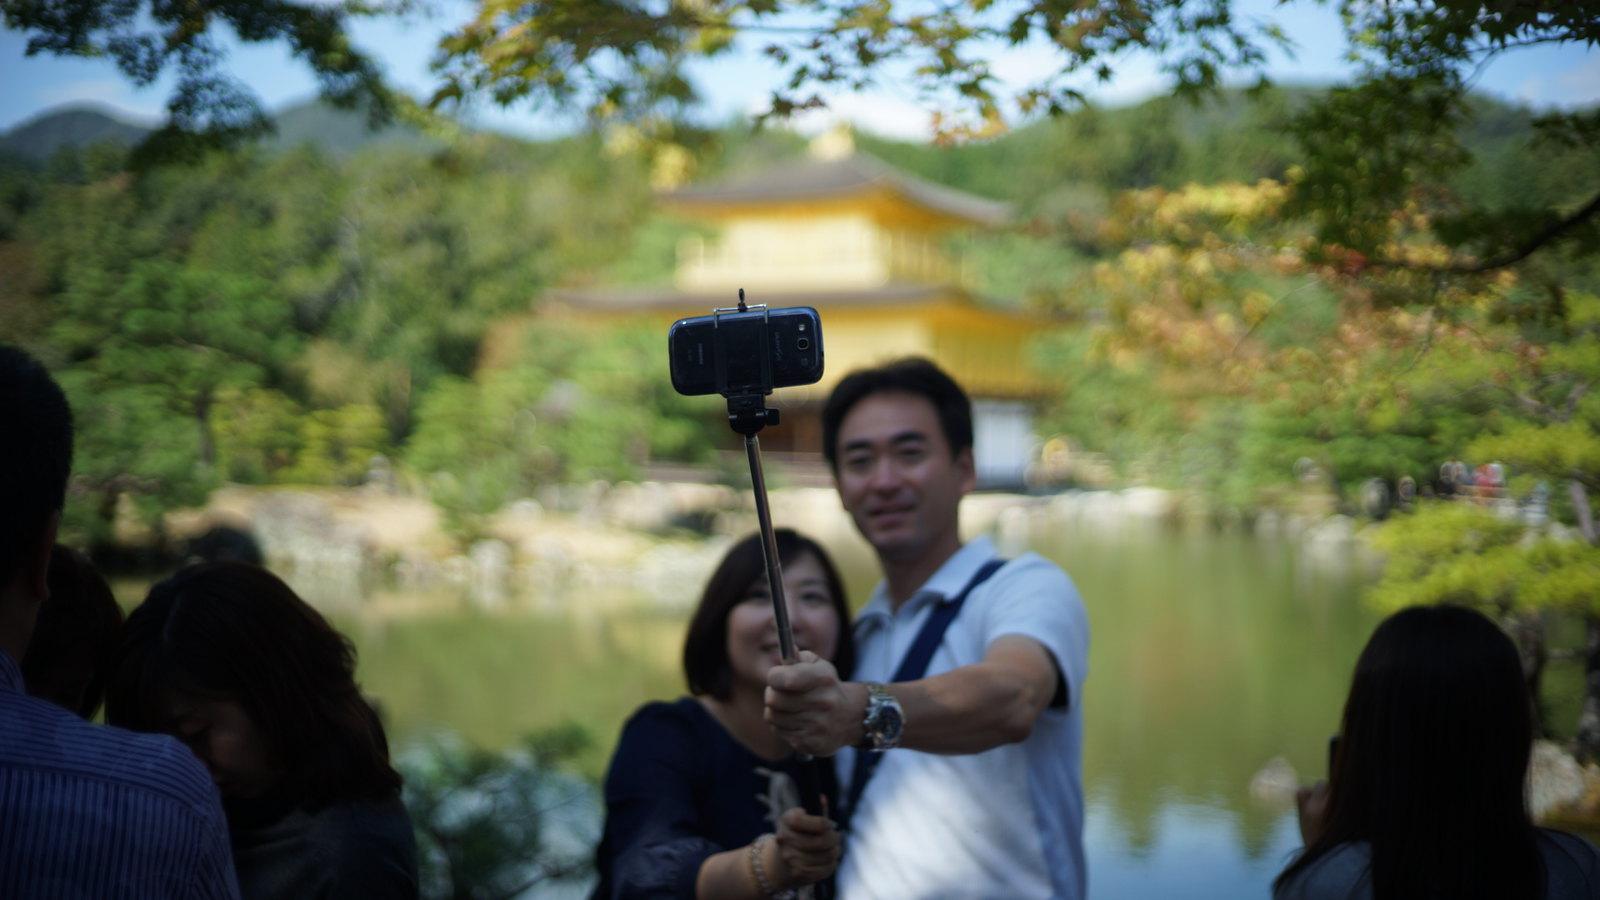 Kinkaku-ji Selfie Stick #foto #japan15 #Kyoto #SonyA7 #Voigtlander40mm #kinkakujii